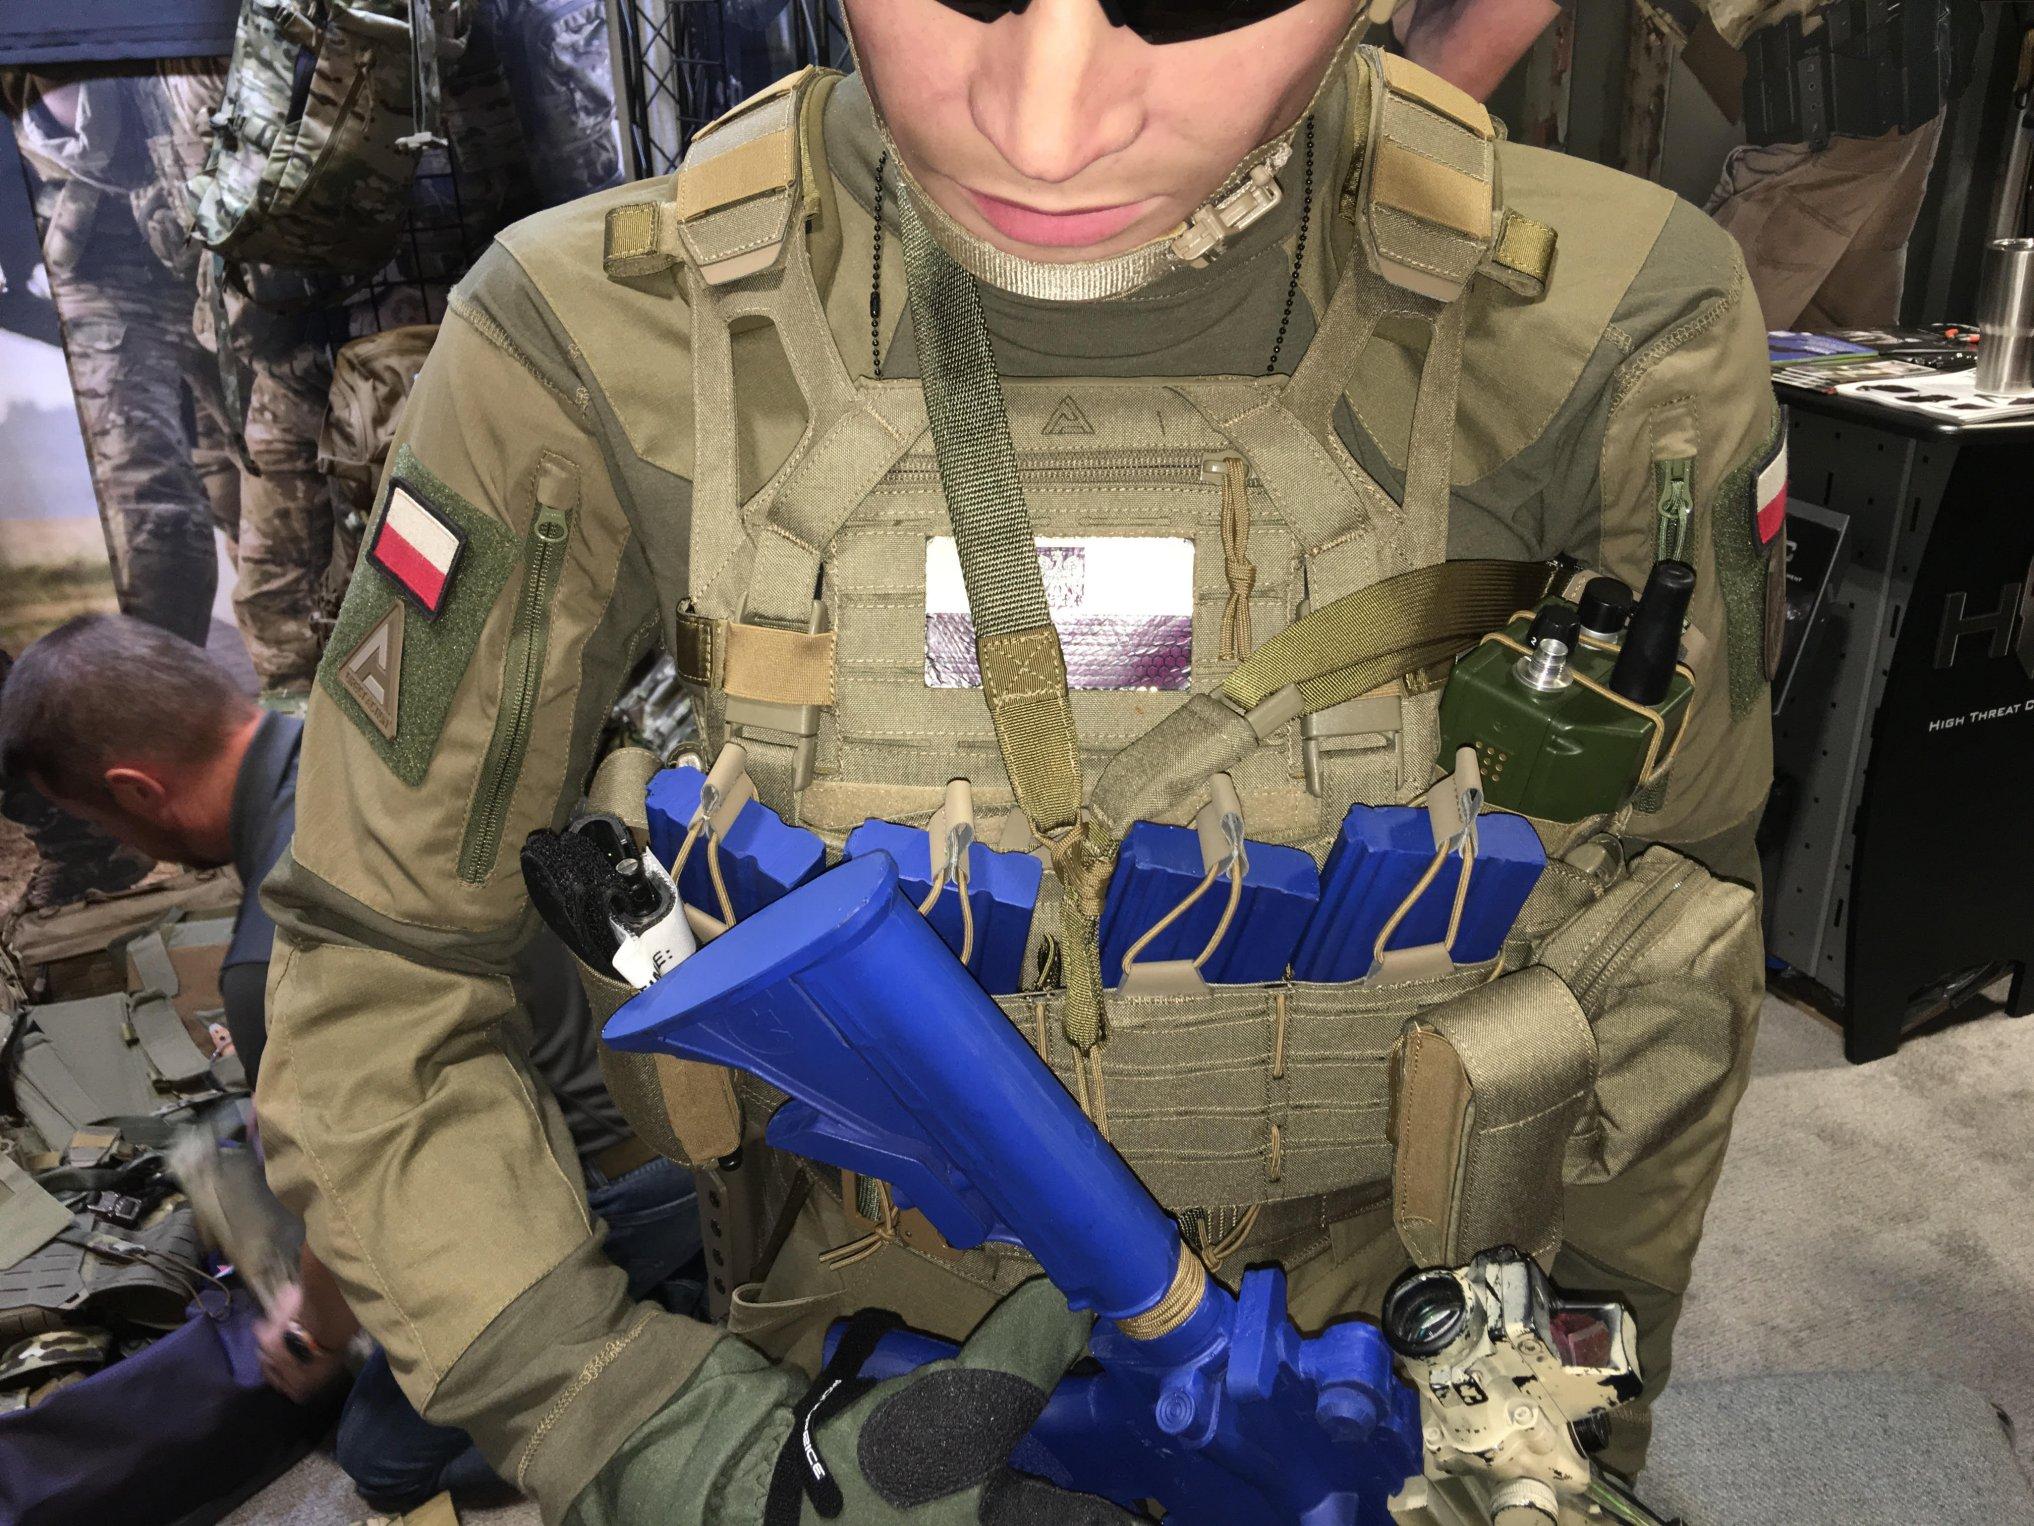 82894b7545b4 Direct Action Advanced Tactical Gear Systems Combat Clothing/Battle Dress  Uniform (BDU) Prototypes: Prototype Combat Shirt and Pants! (Photos!)